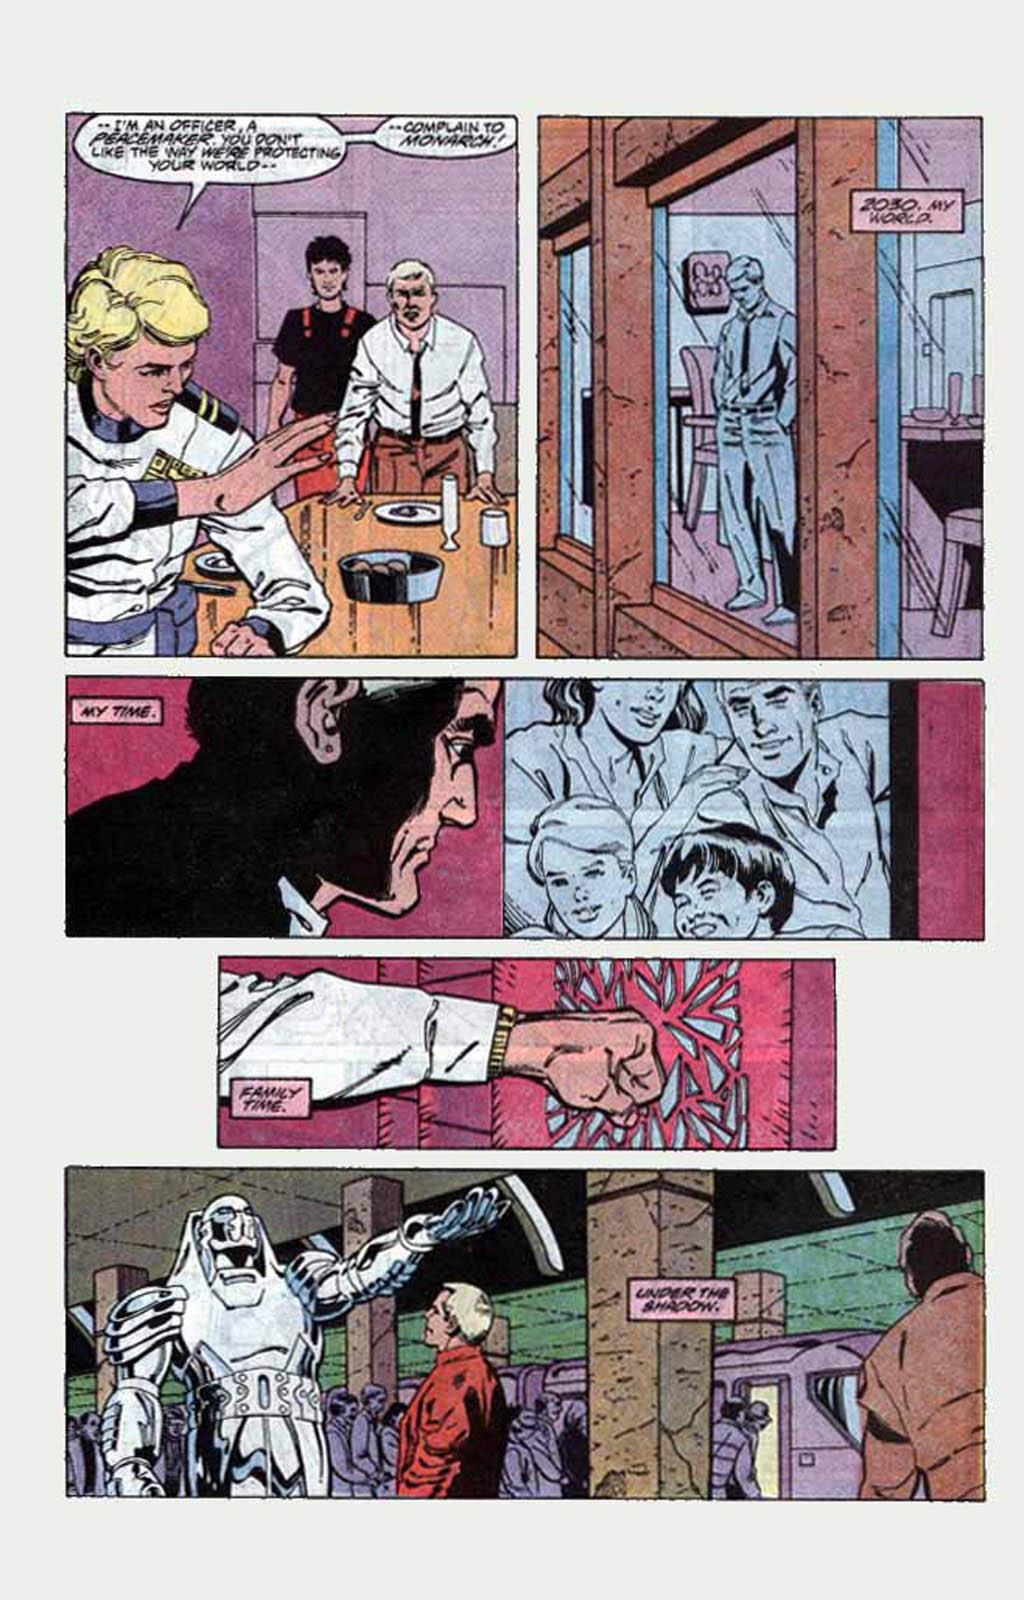 Read online Armageddon 2001 comic -  Issue #1 - 23